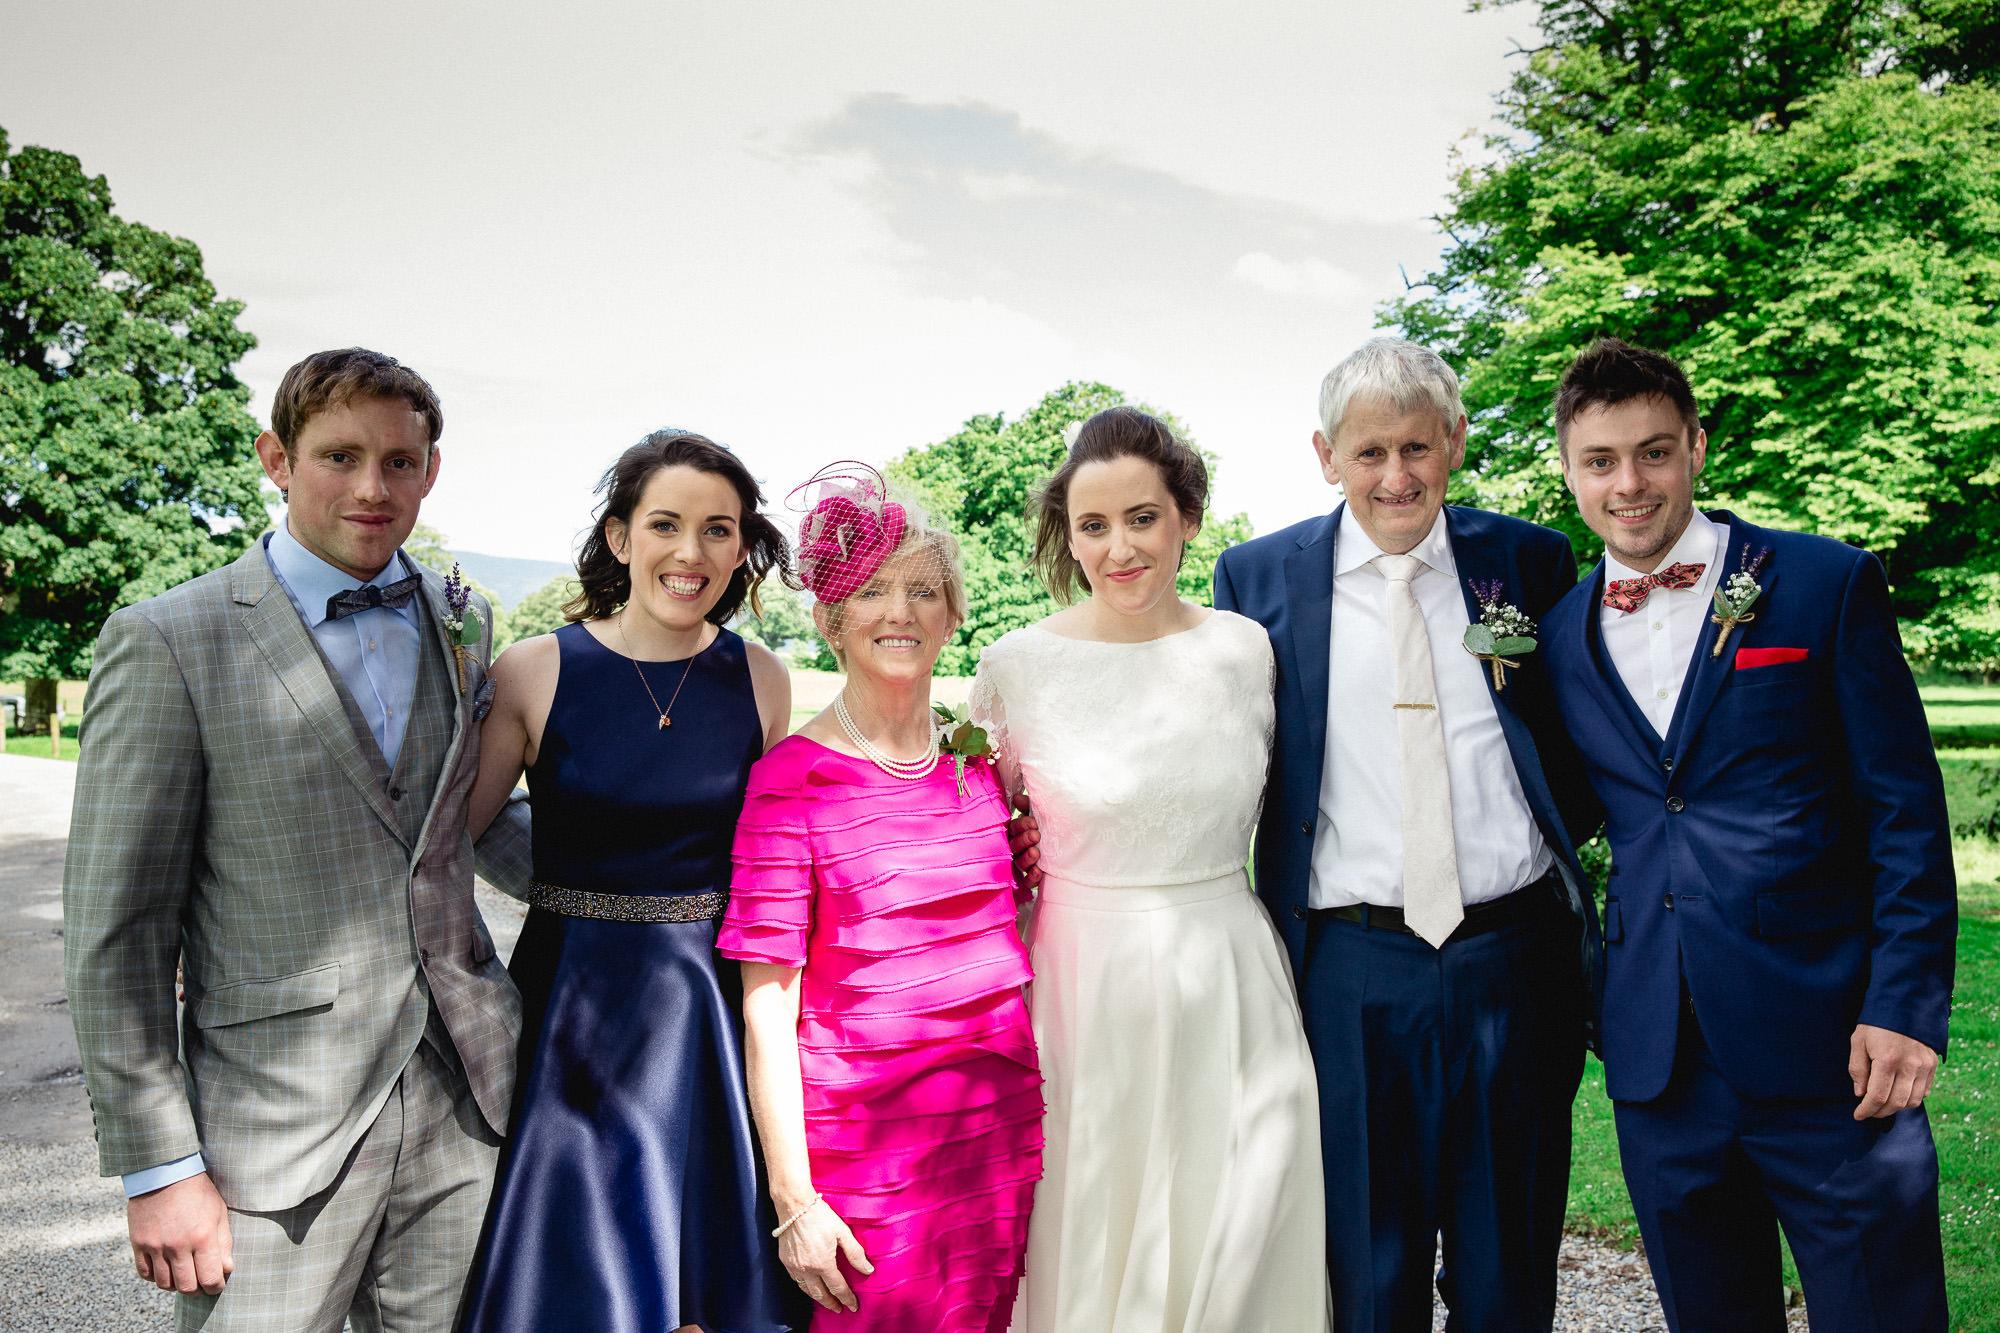 CLAIREBYRNEPHOTOGRAPHY-WEDDING-Ireland-cloncody-alternative-fun-Jen-Helena-3.jpg